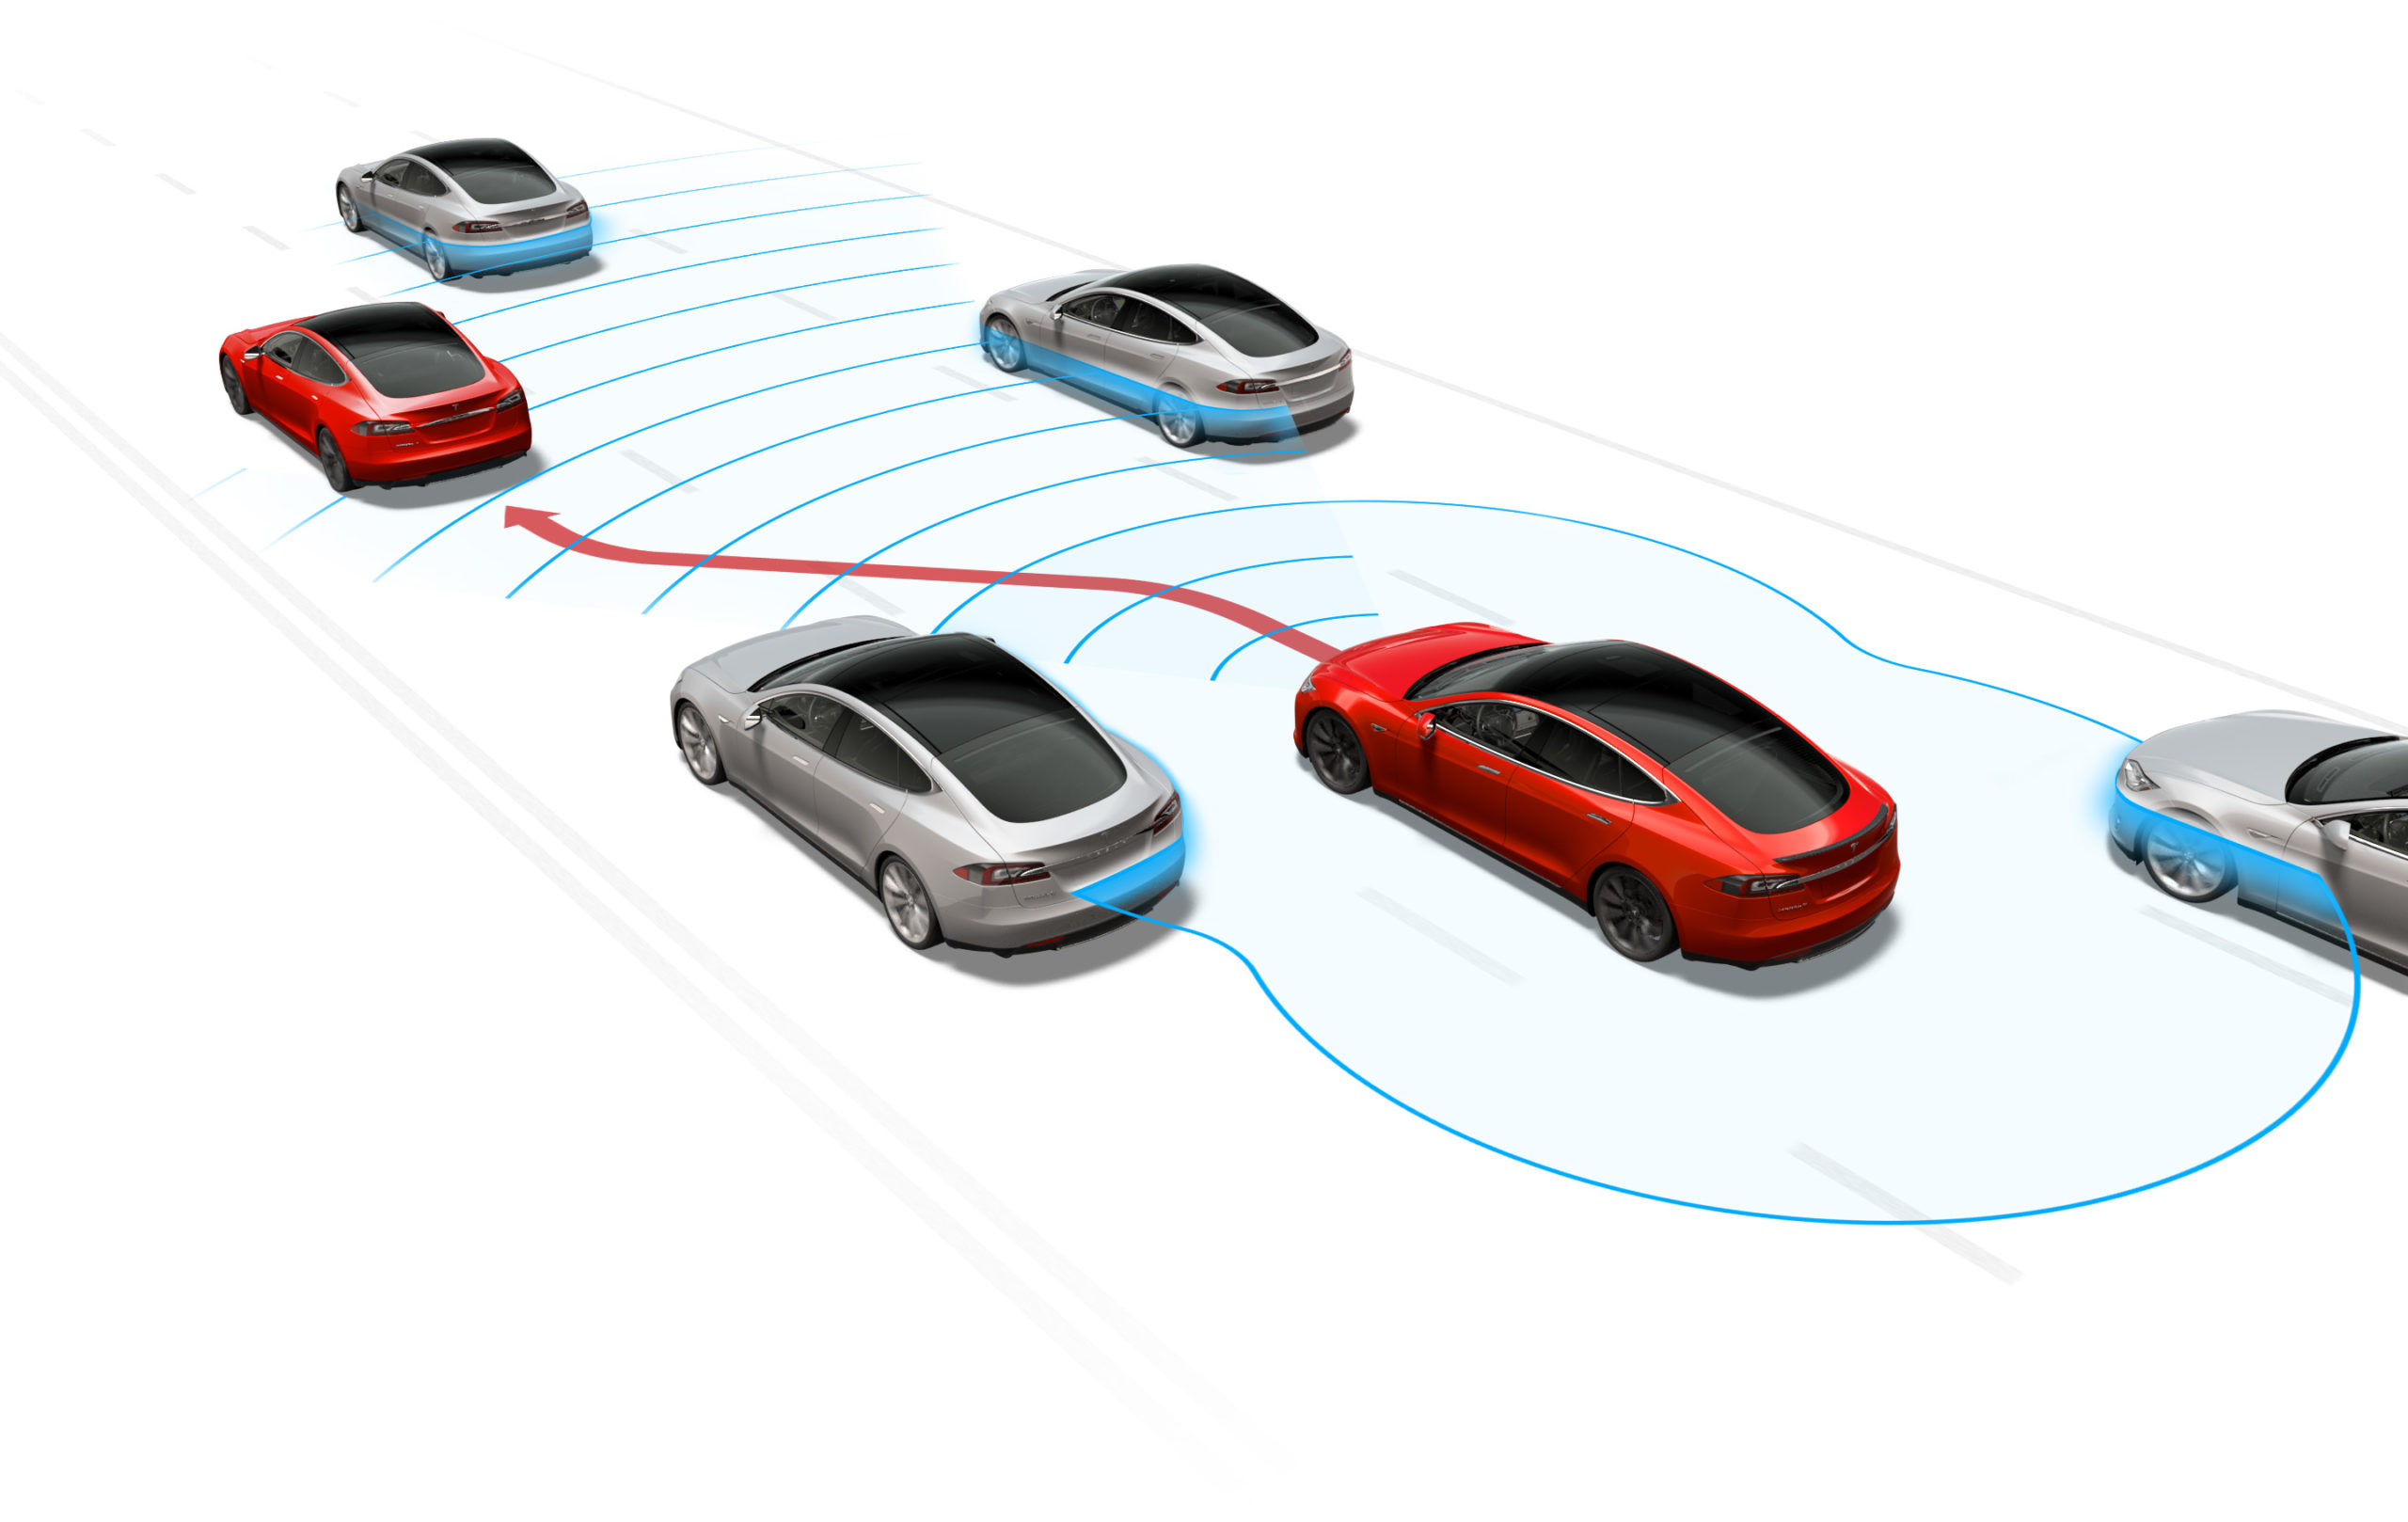 Image of Autopilot